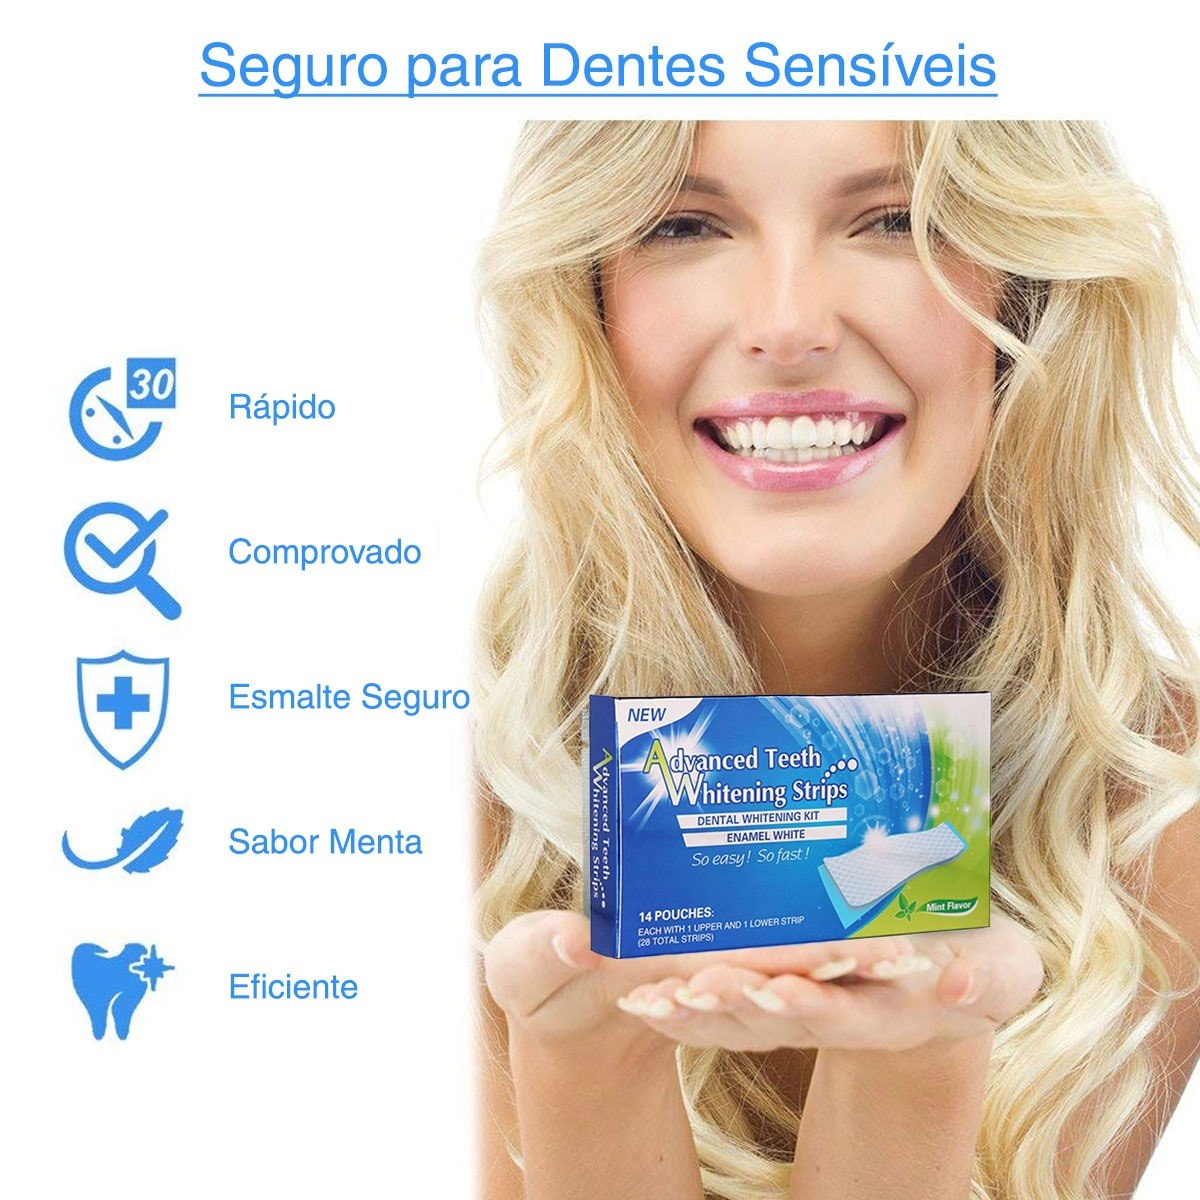 Tira Clareadora Dental Clareamento Dentes 28 Fita White Gel R 34